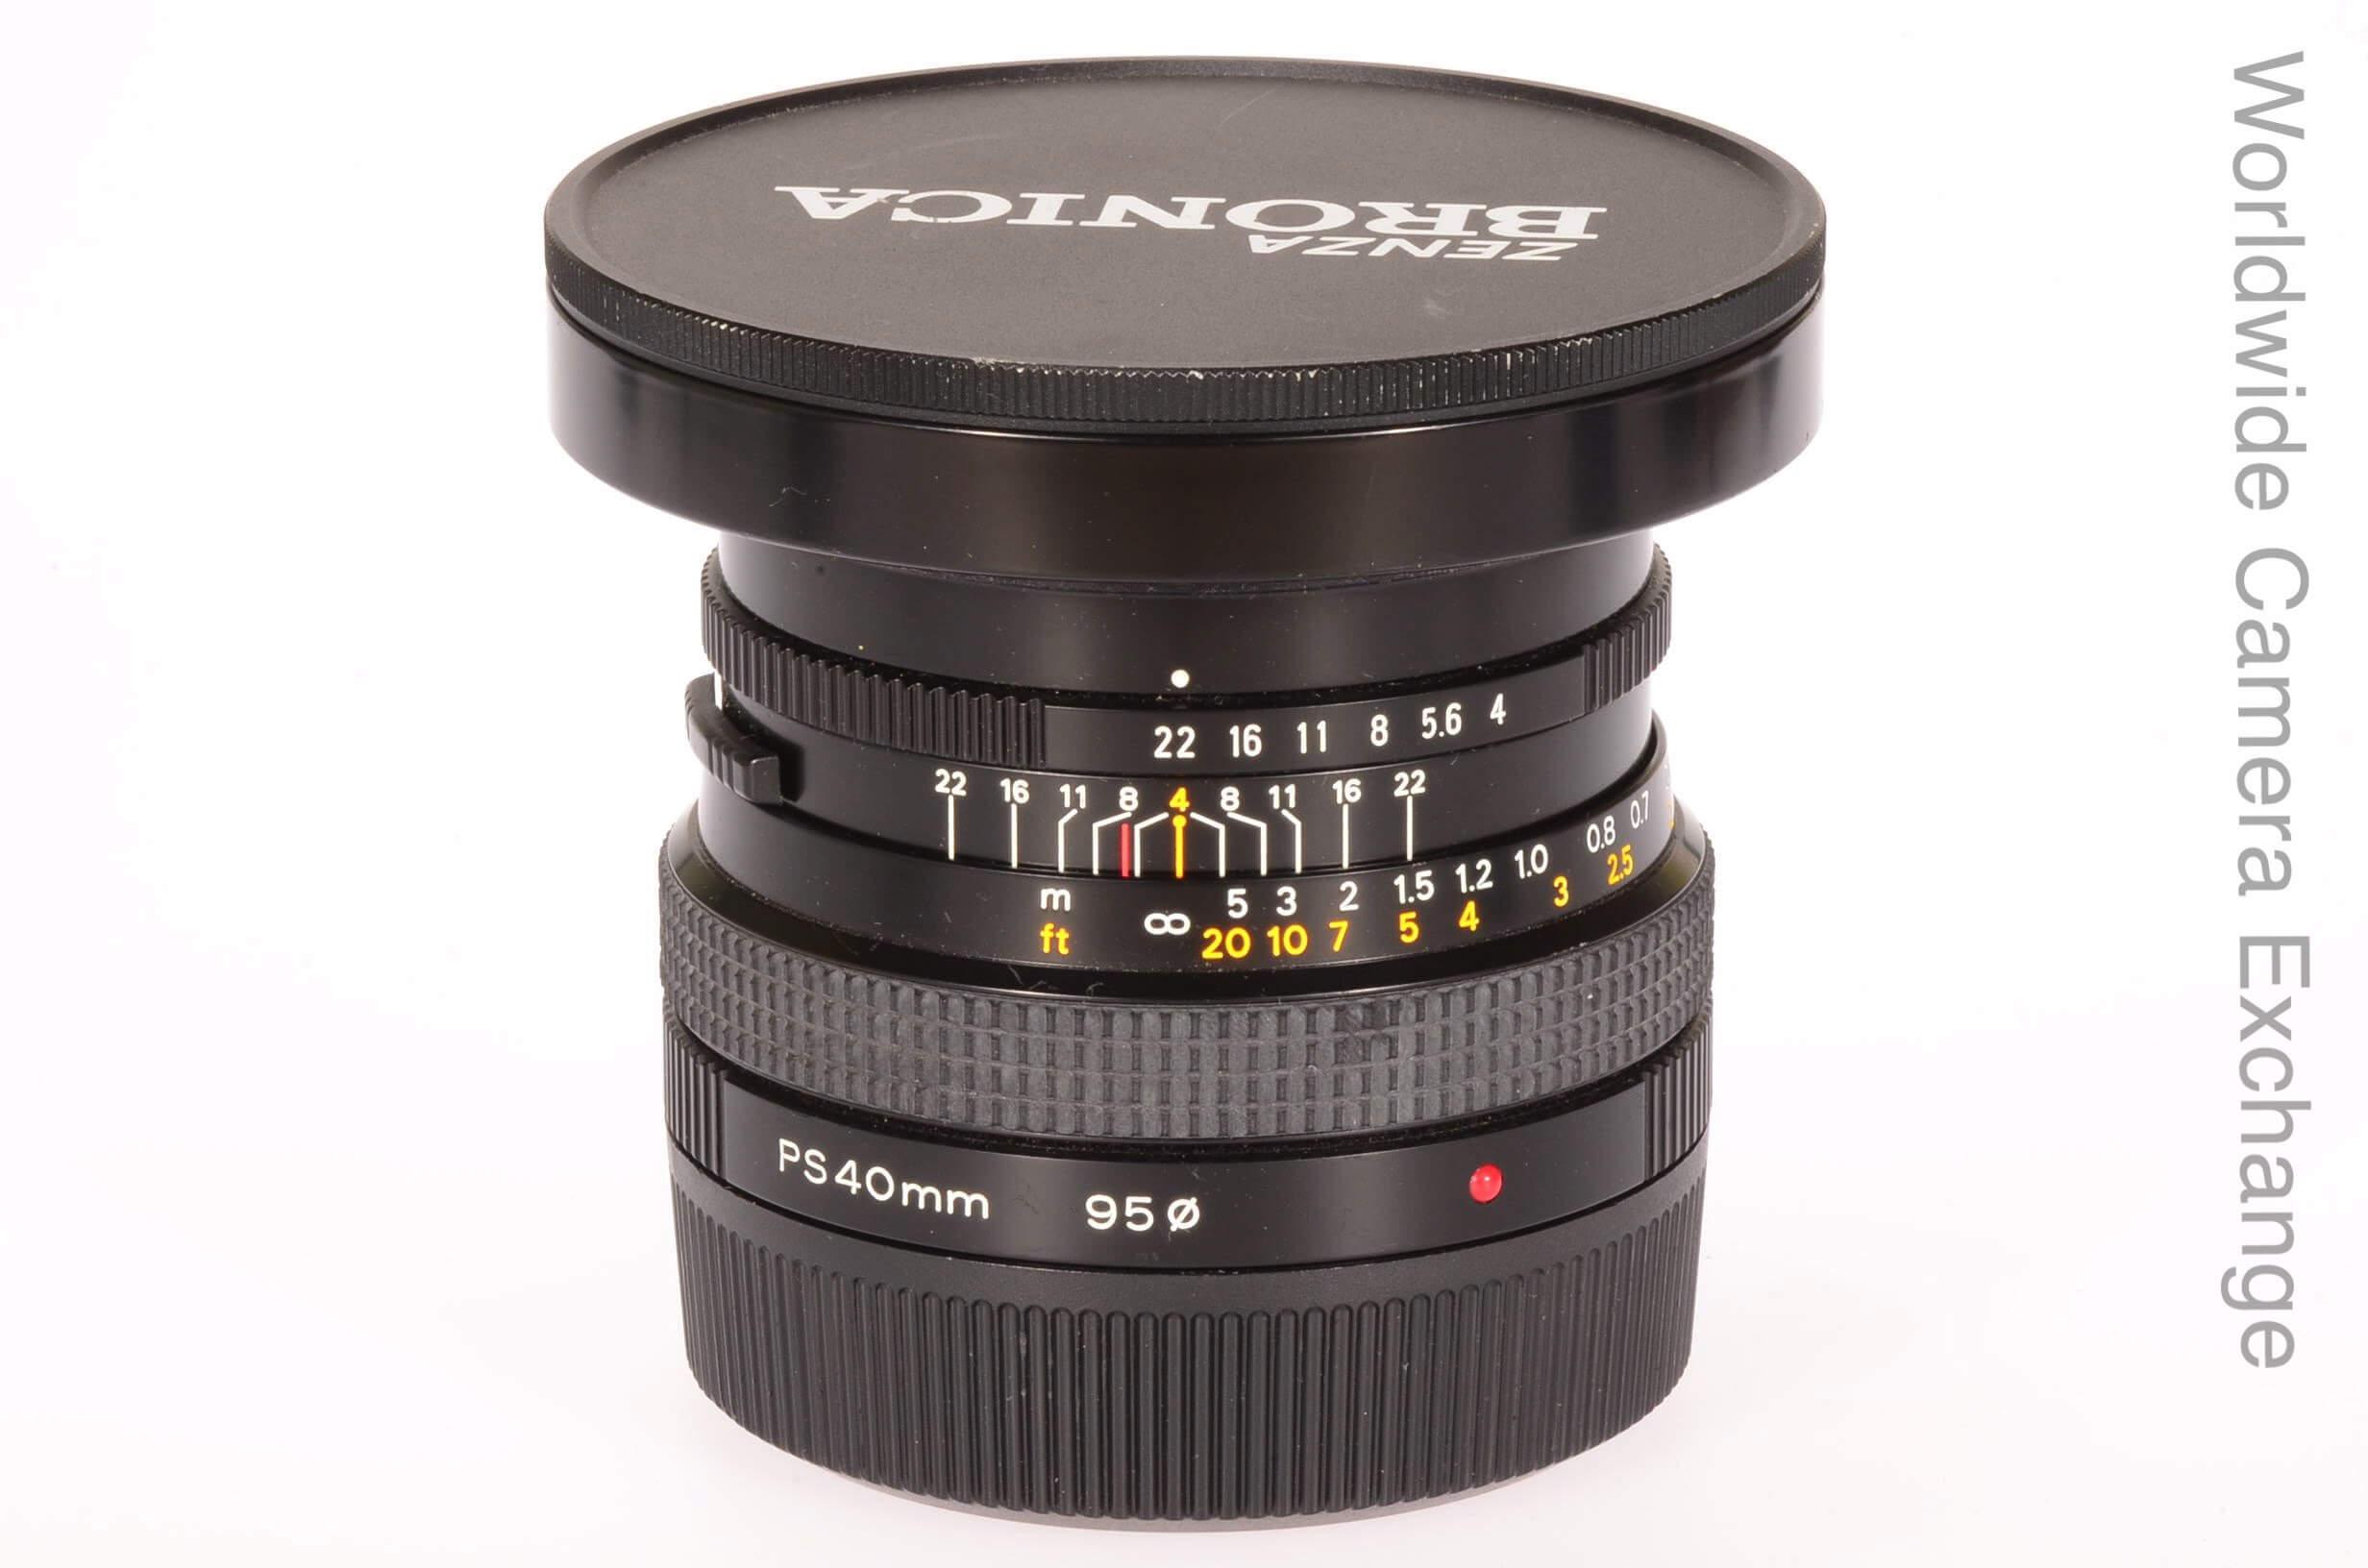 Bronica 40mm f4 Zenzanon PS, virtually mint!